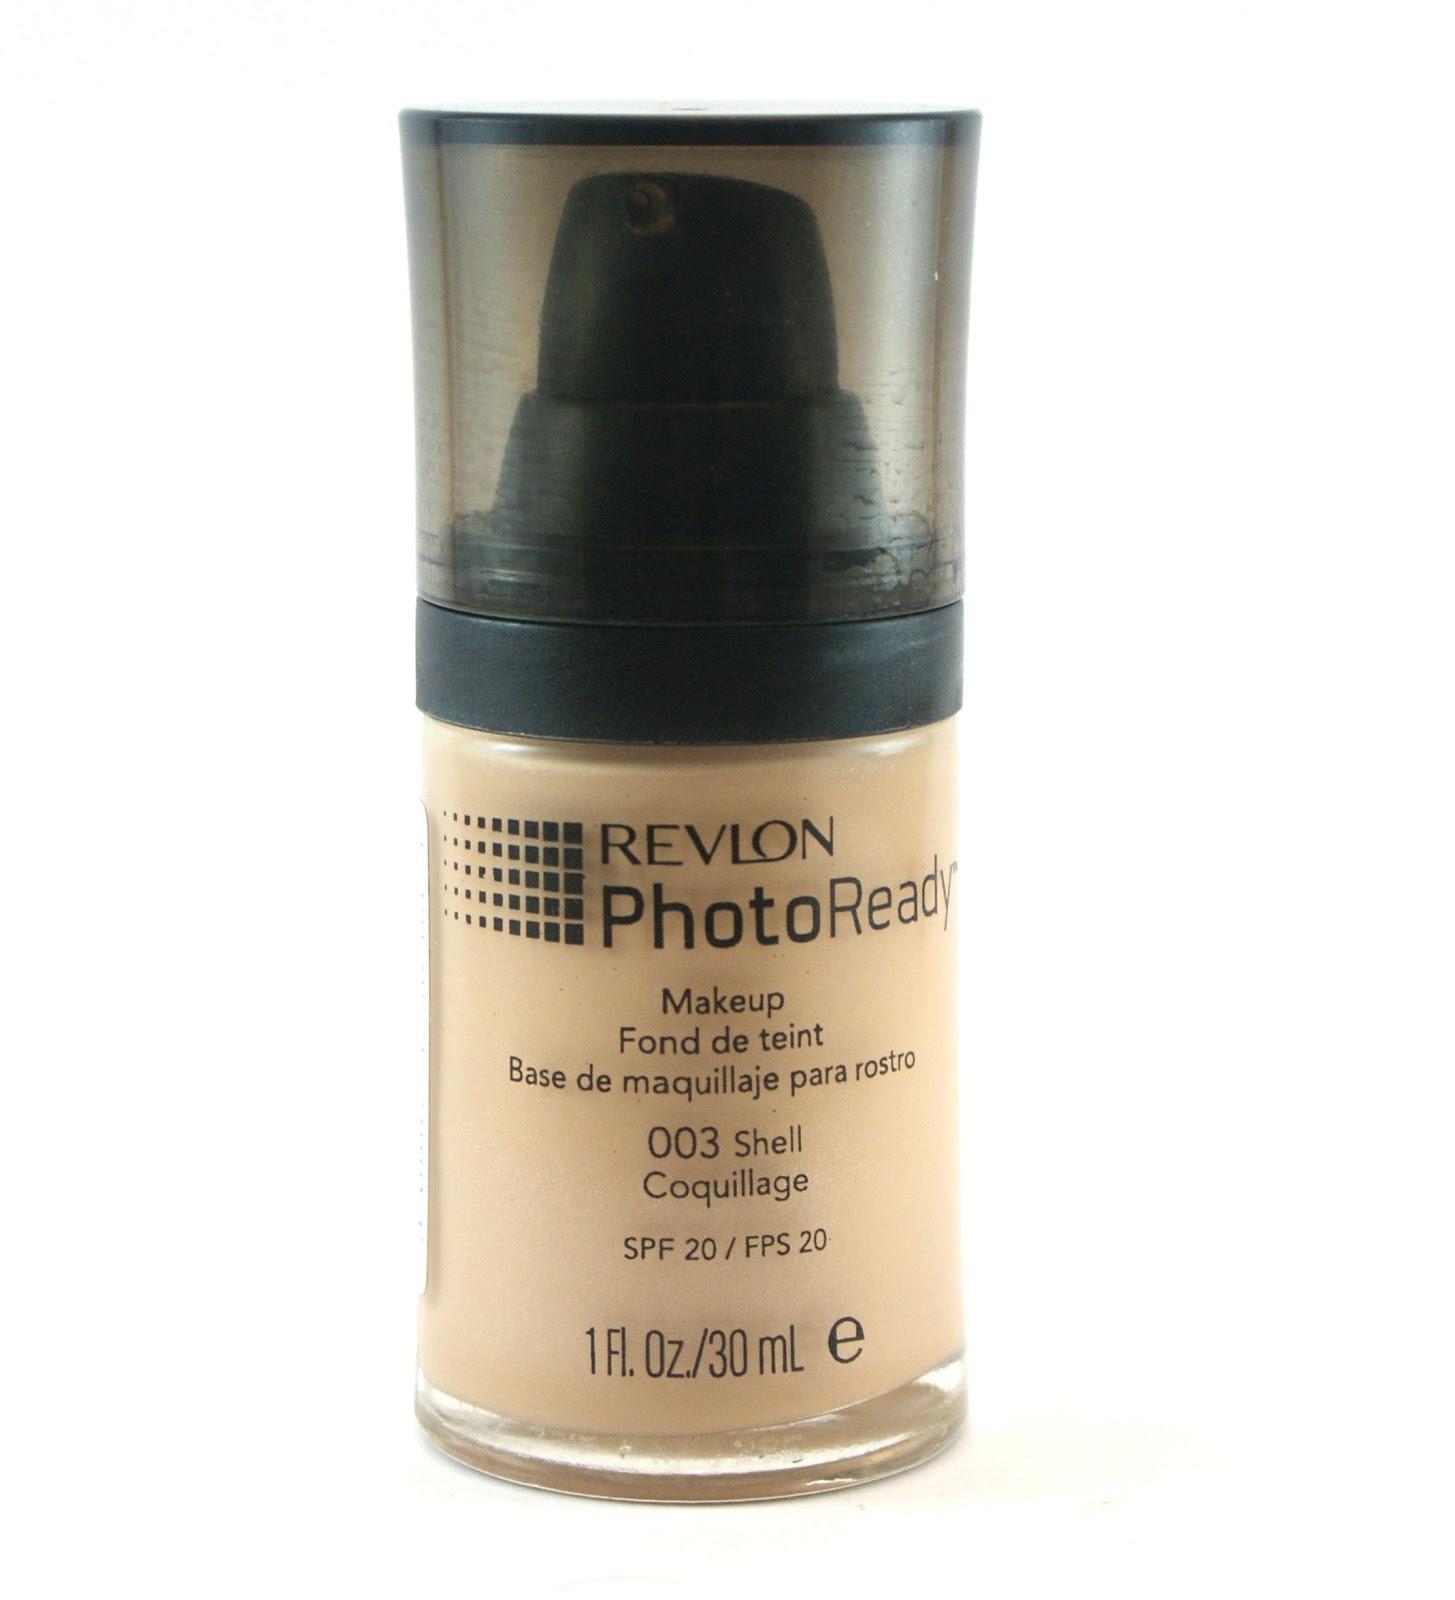 maquillaje photoready revlon